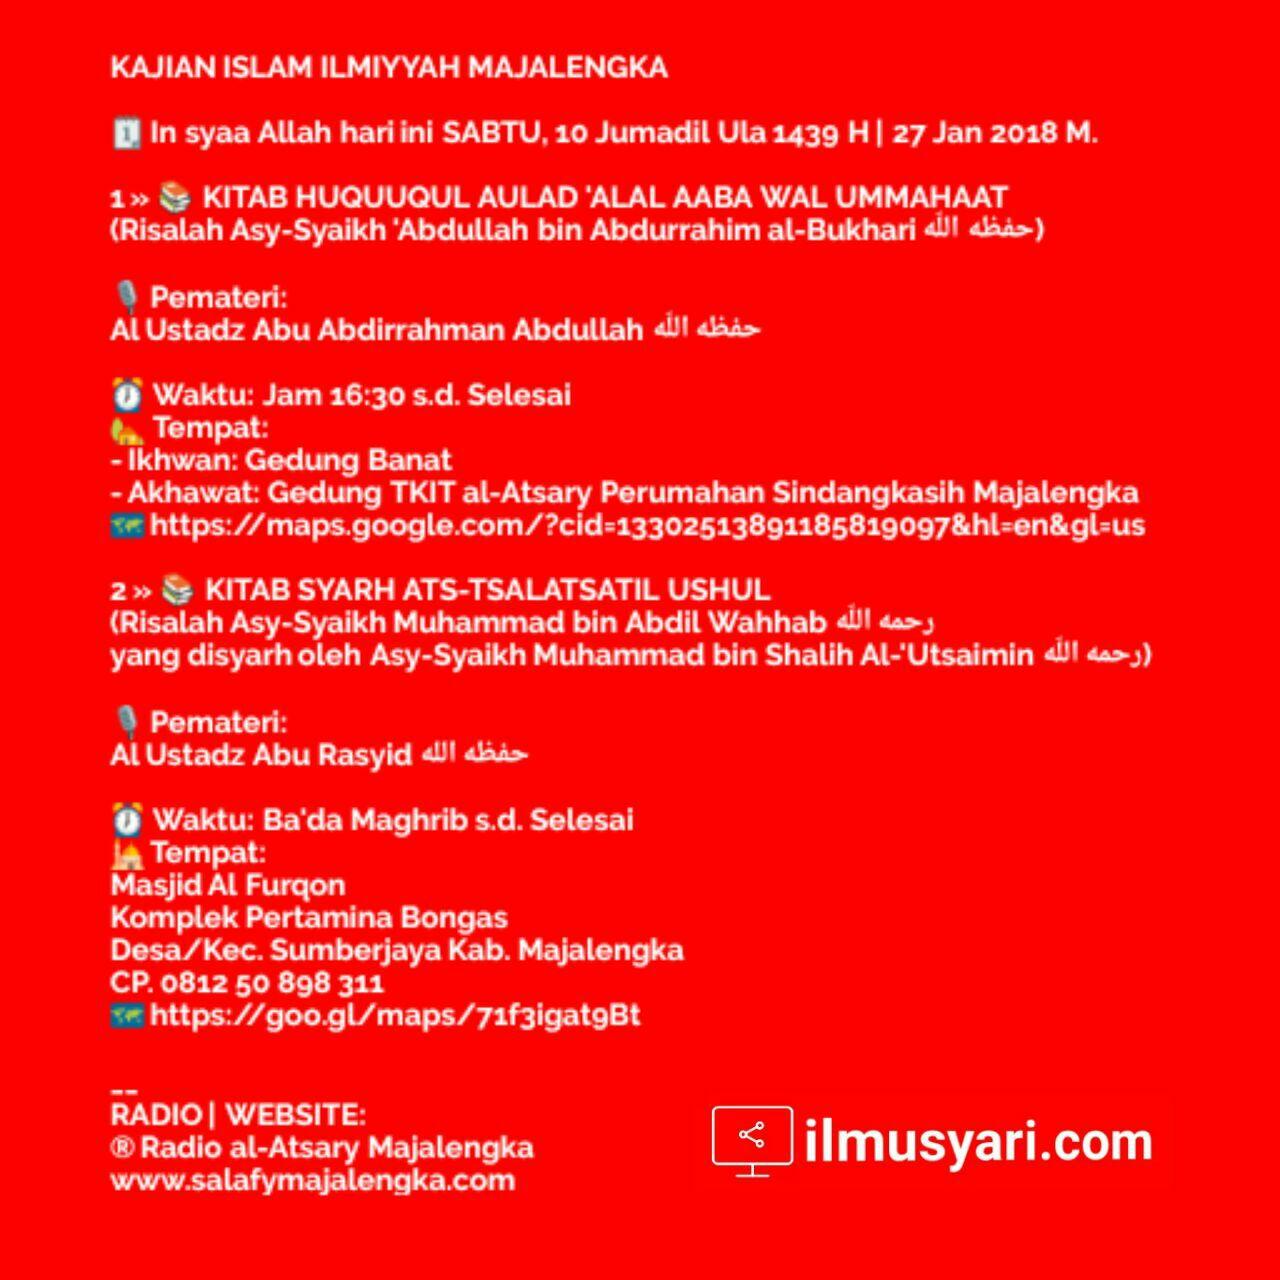 info kajian salafy di #Majalengka (27/01/2018)